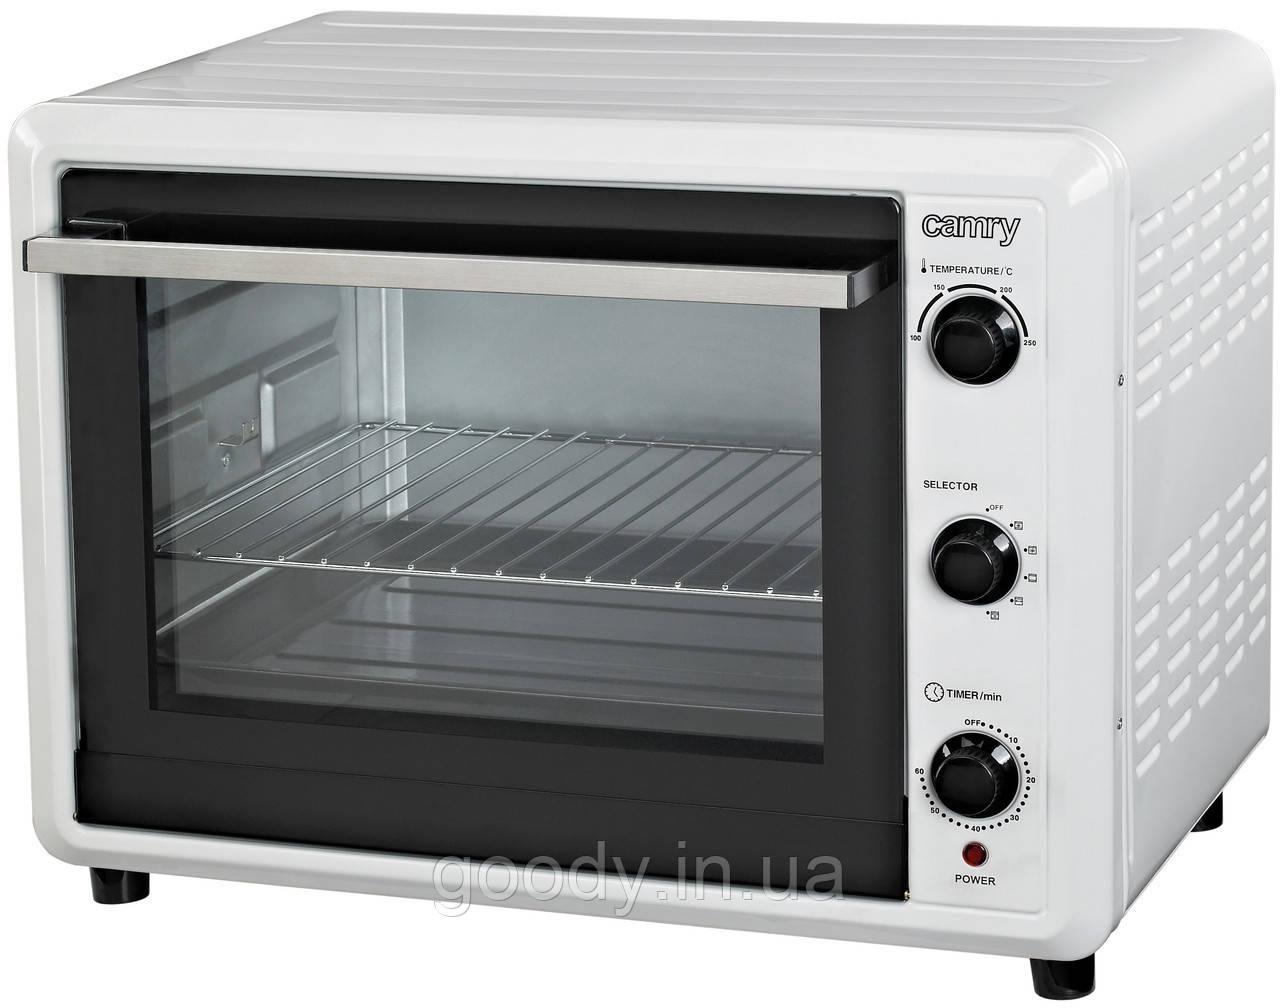 Духовий шкаф електричний Camry CR 6008 2000 Вт 63 л